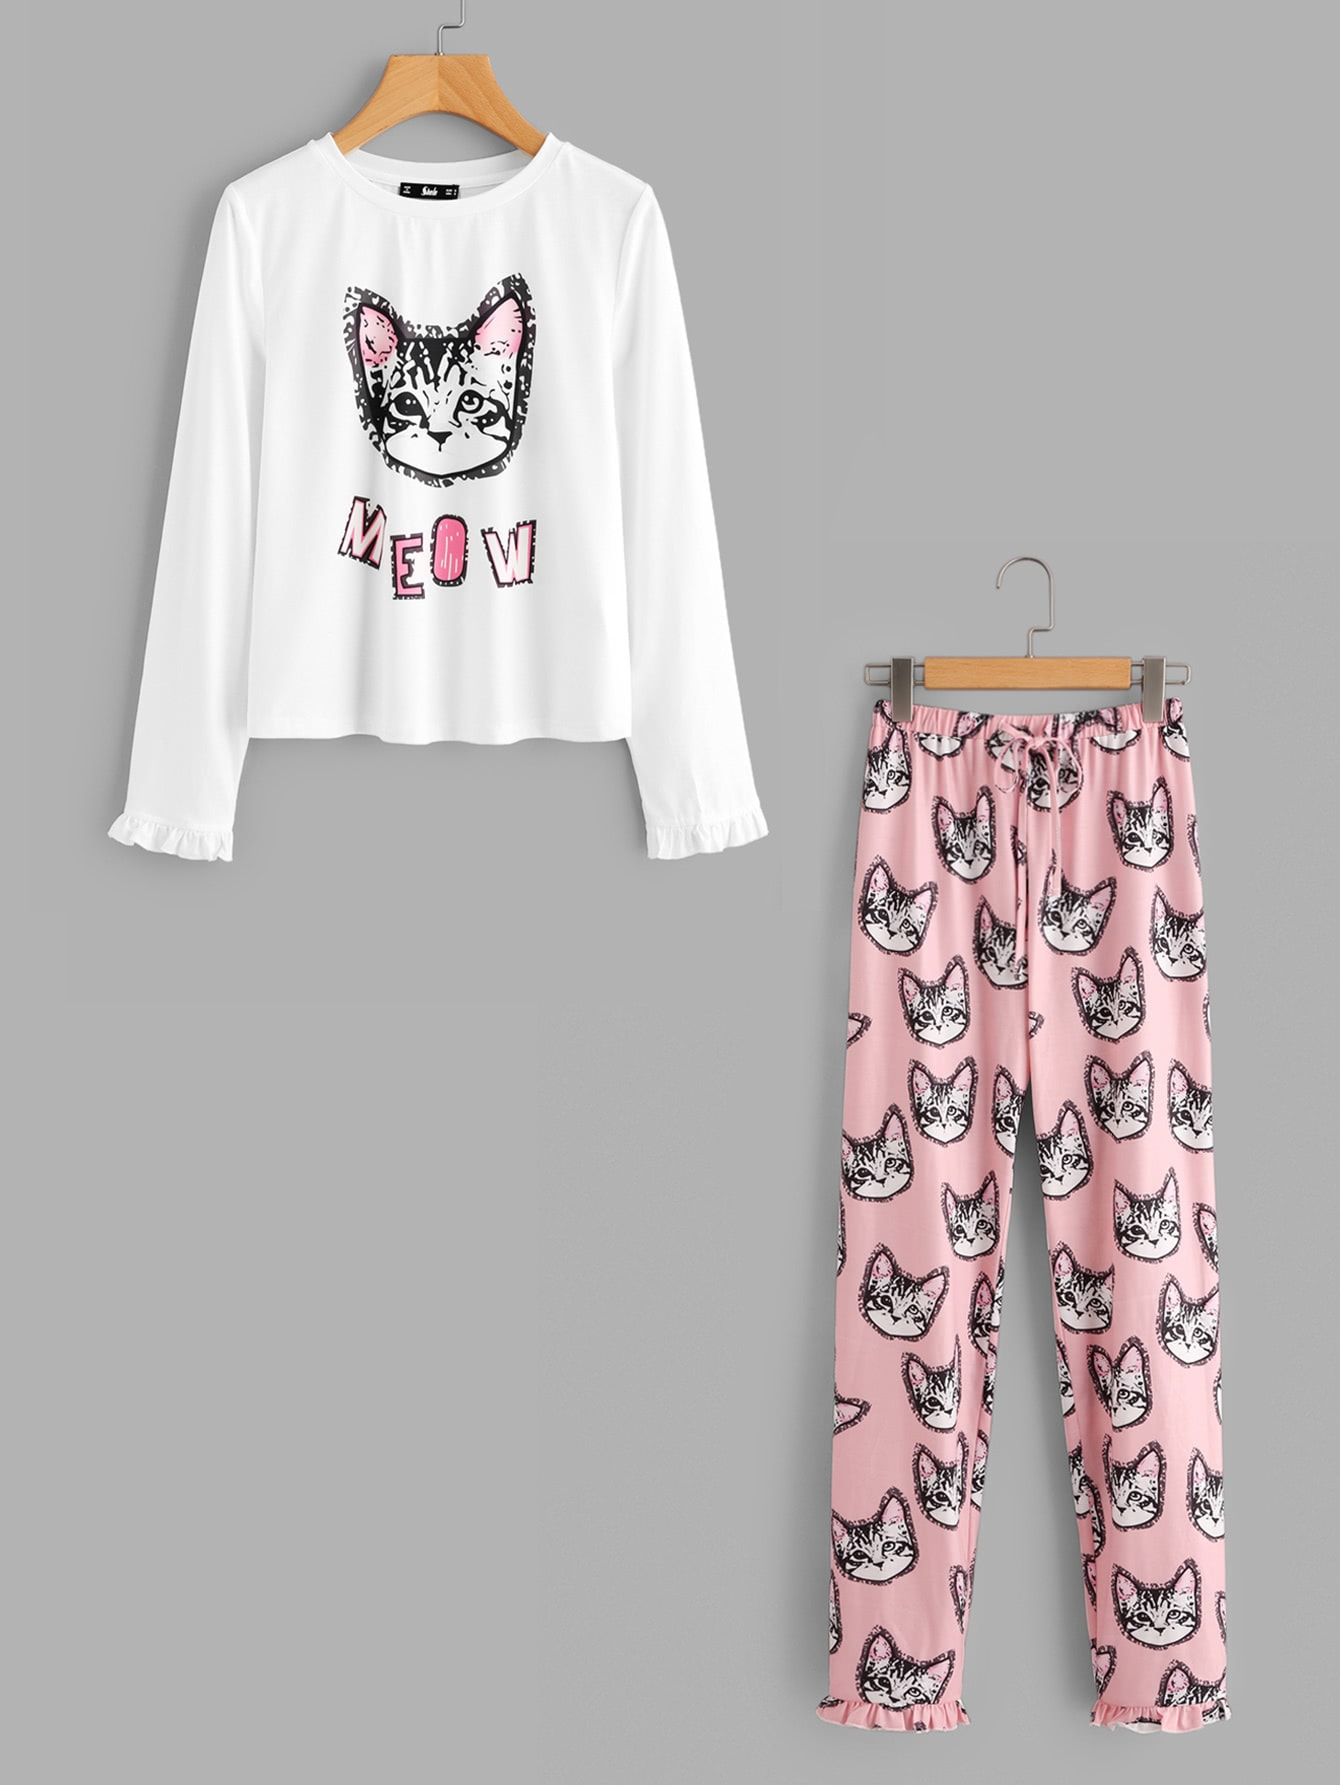 Cats Print Frill Cuff Top And Pants Pajama Set high low top and frill hem shorts pajama set